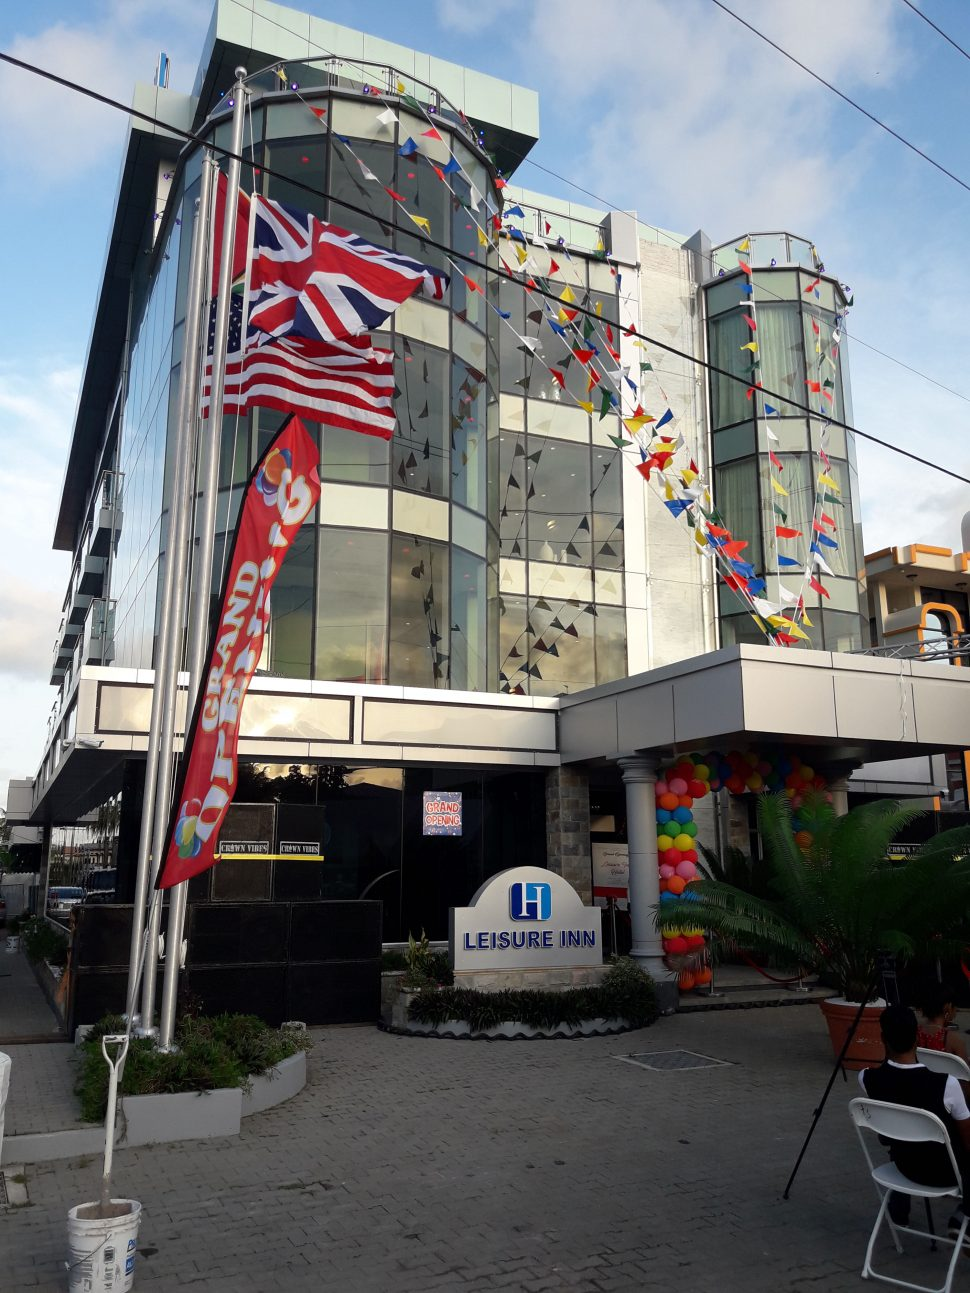 New Amsterdam gets $450m hotel – Stabroek News